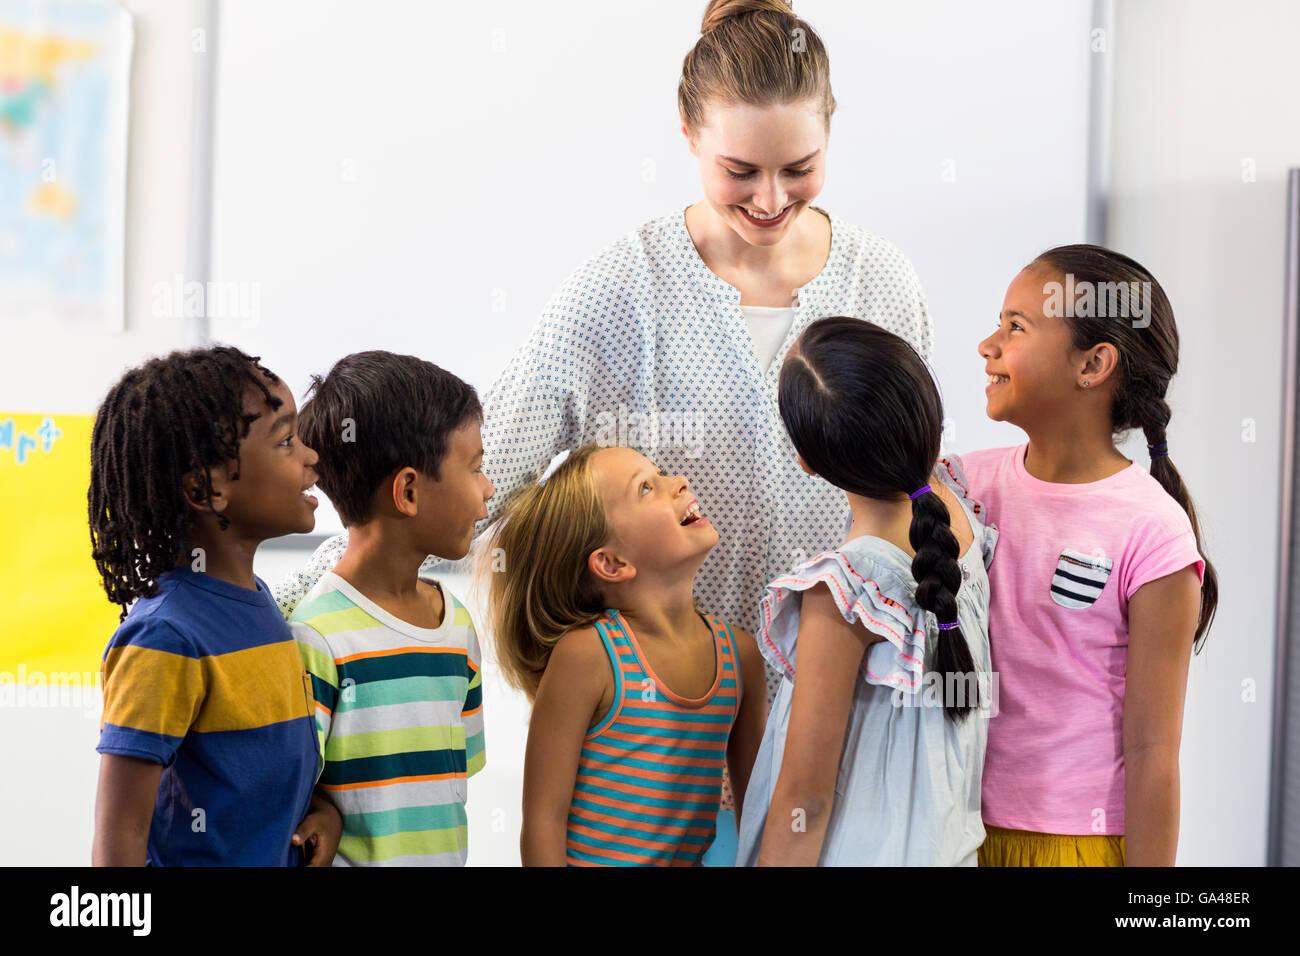 female teacher with schoolchildren - Stock Image